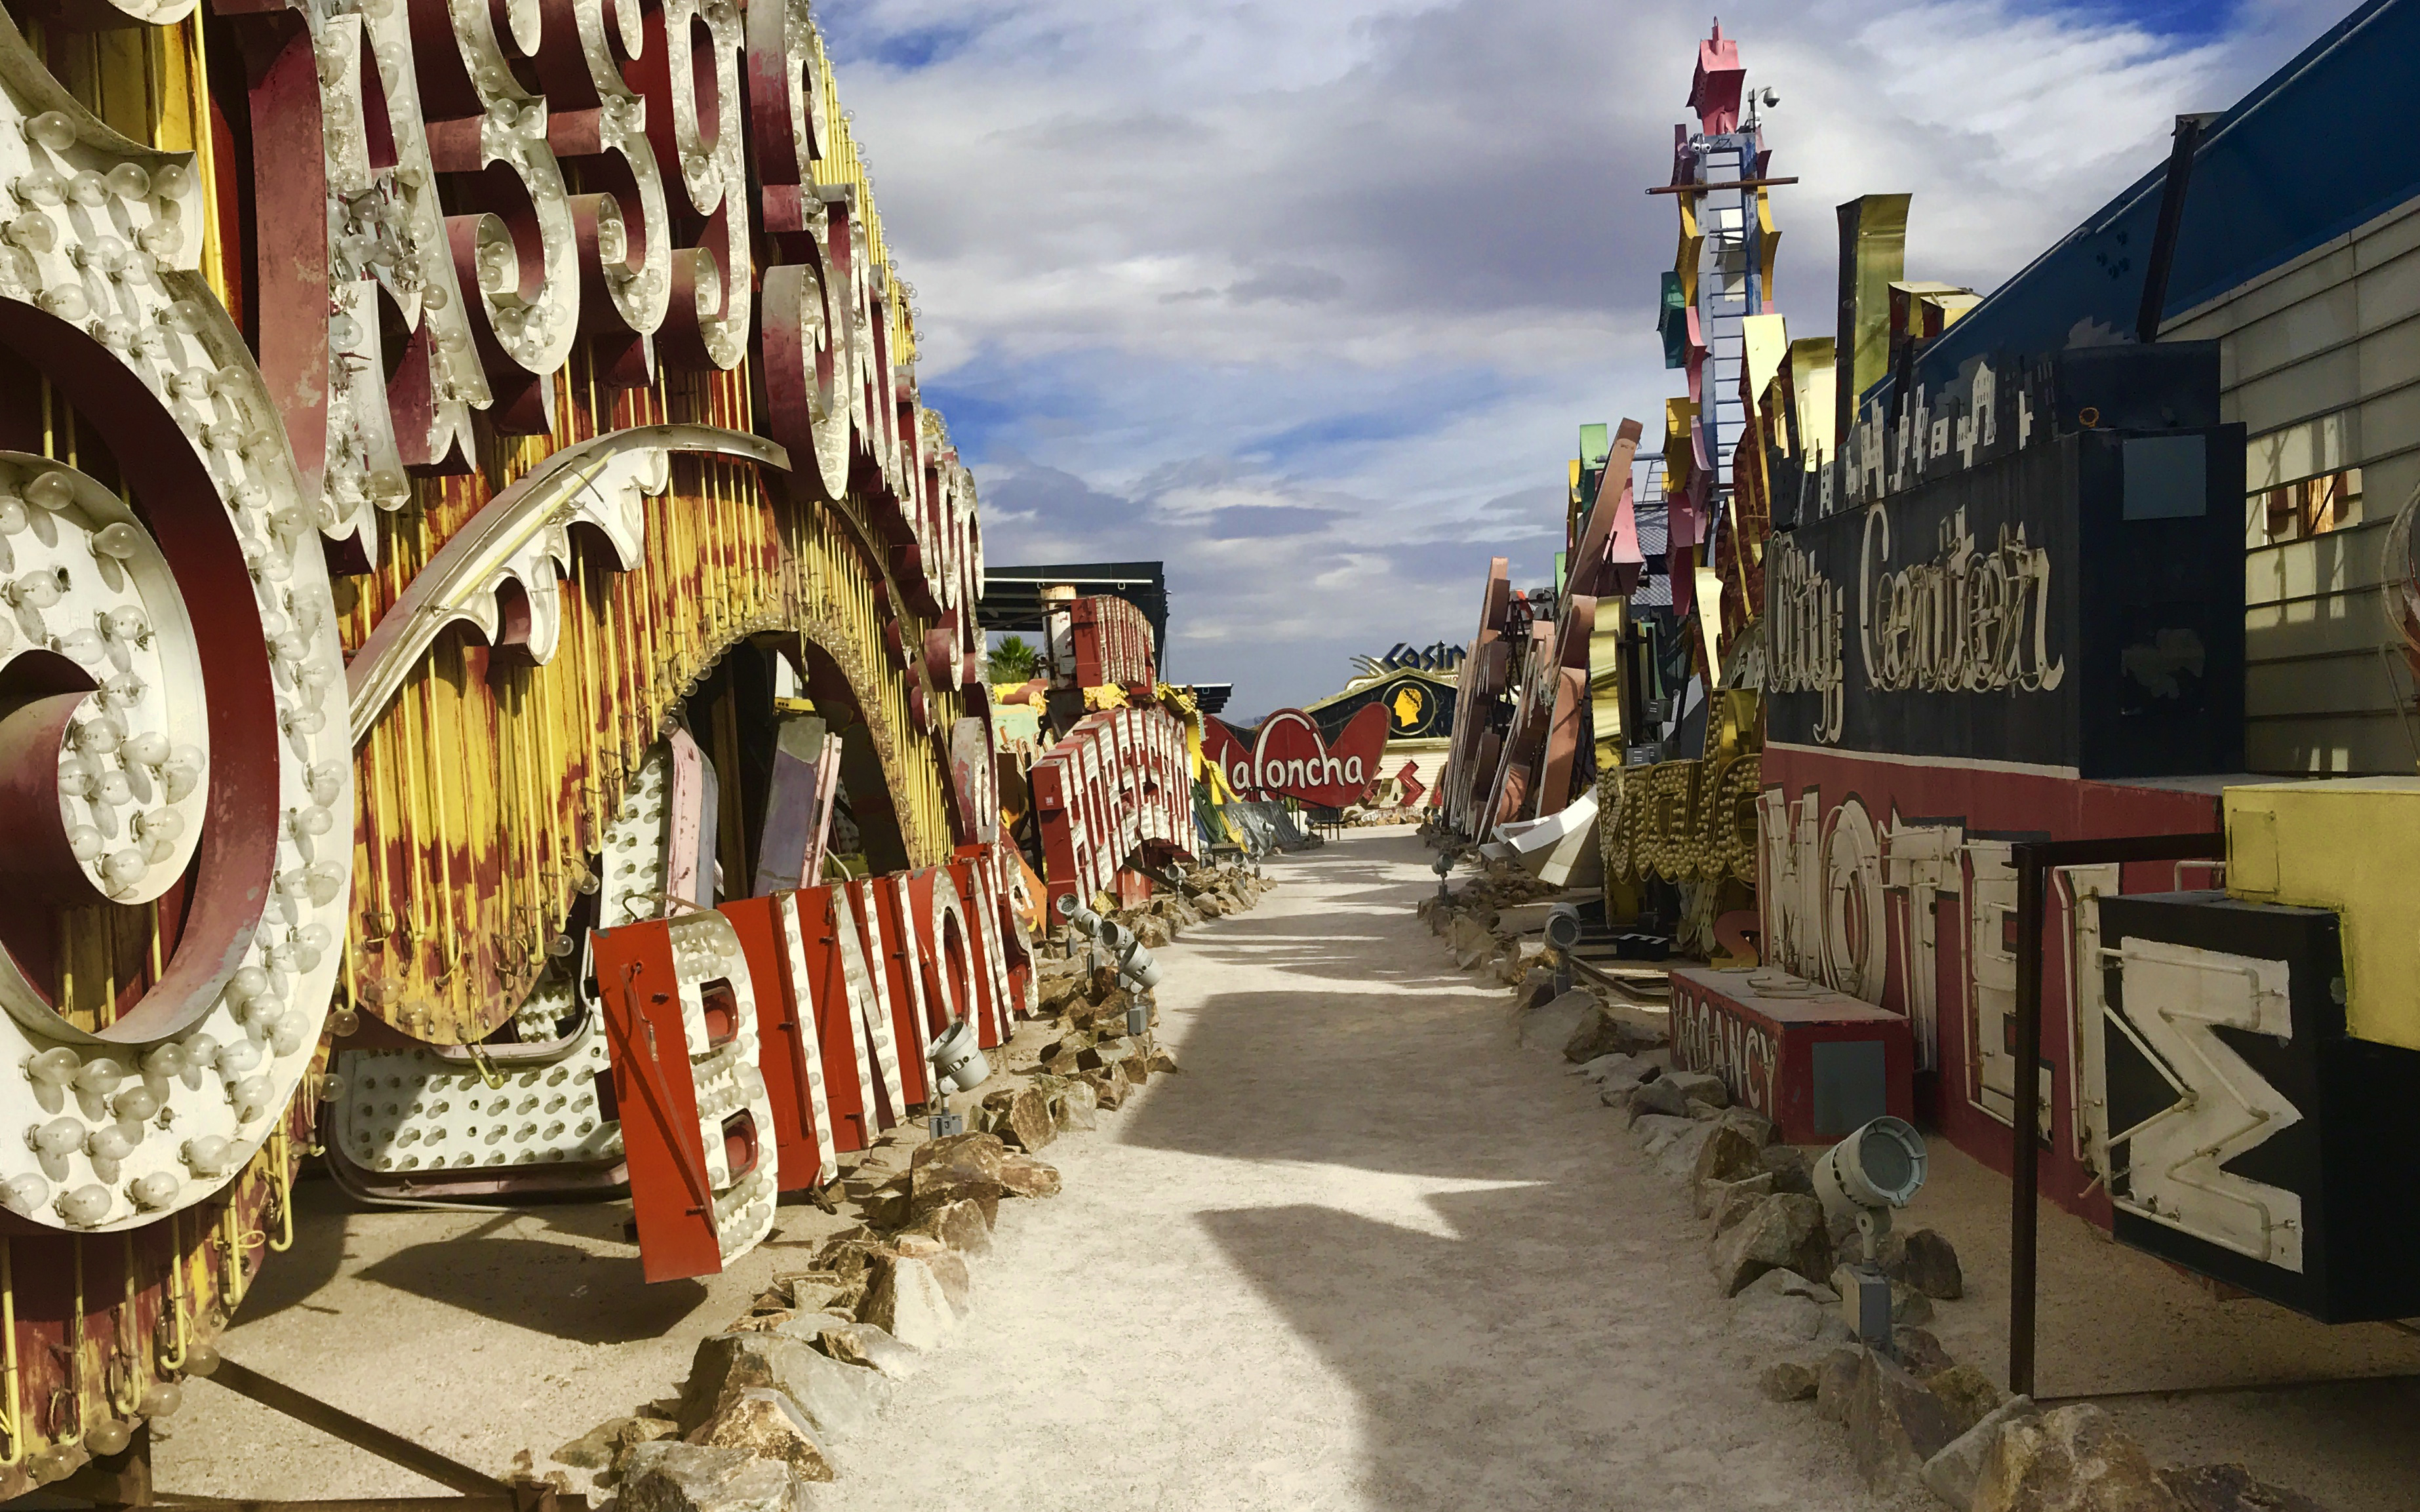 Focus: Breaking Travel News investigates: Las Vegas, a cultural desert